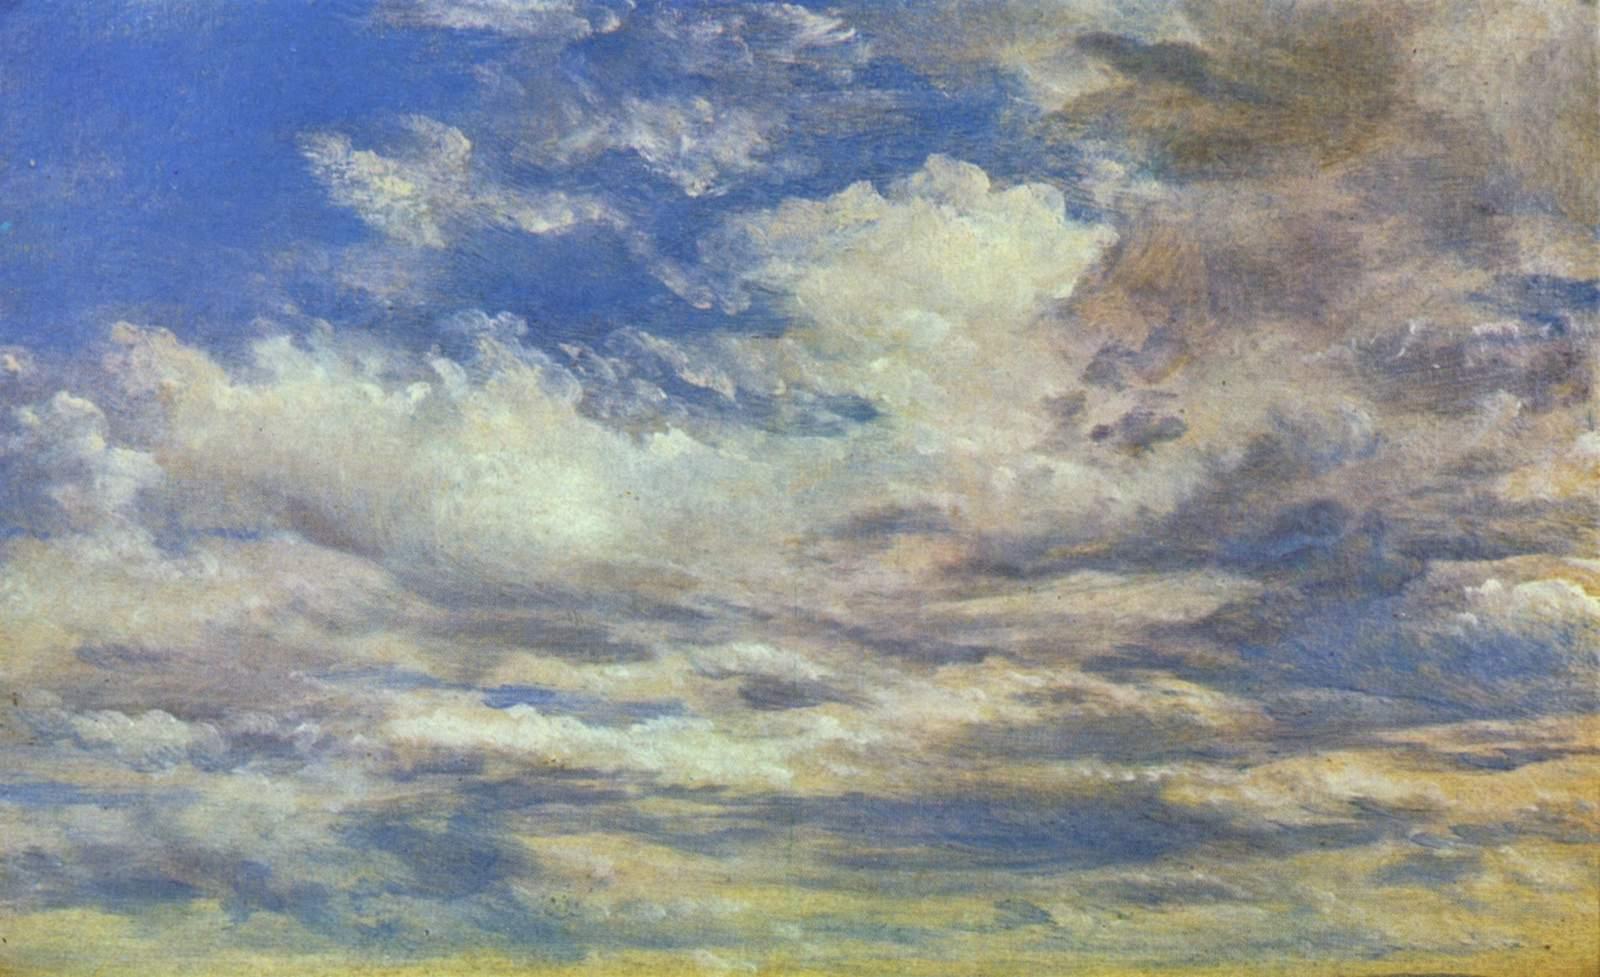 cloud-study-1822.jpg